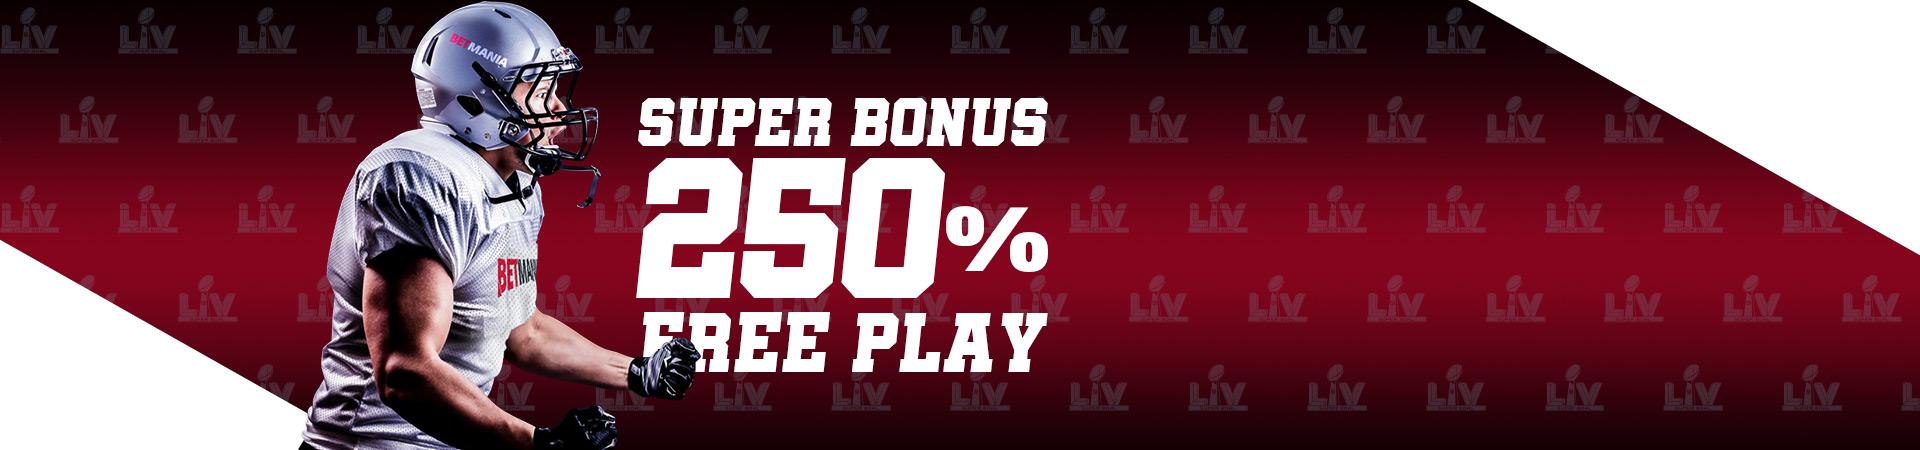 Super Bonus! 250% Free Play!